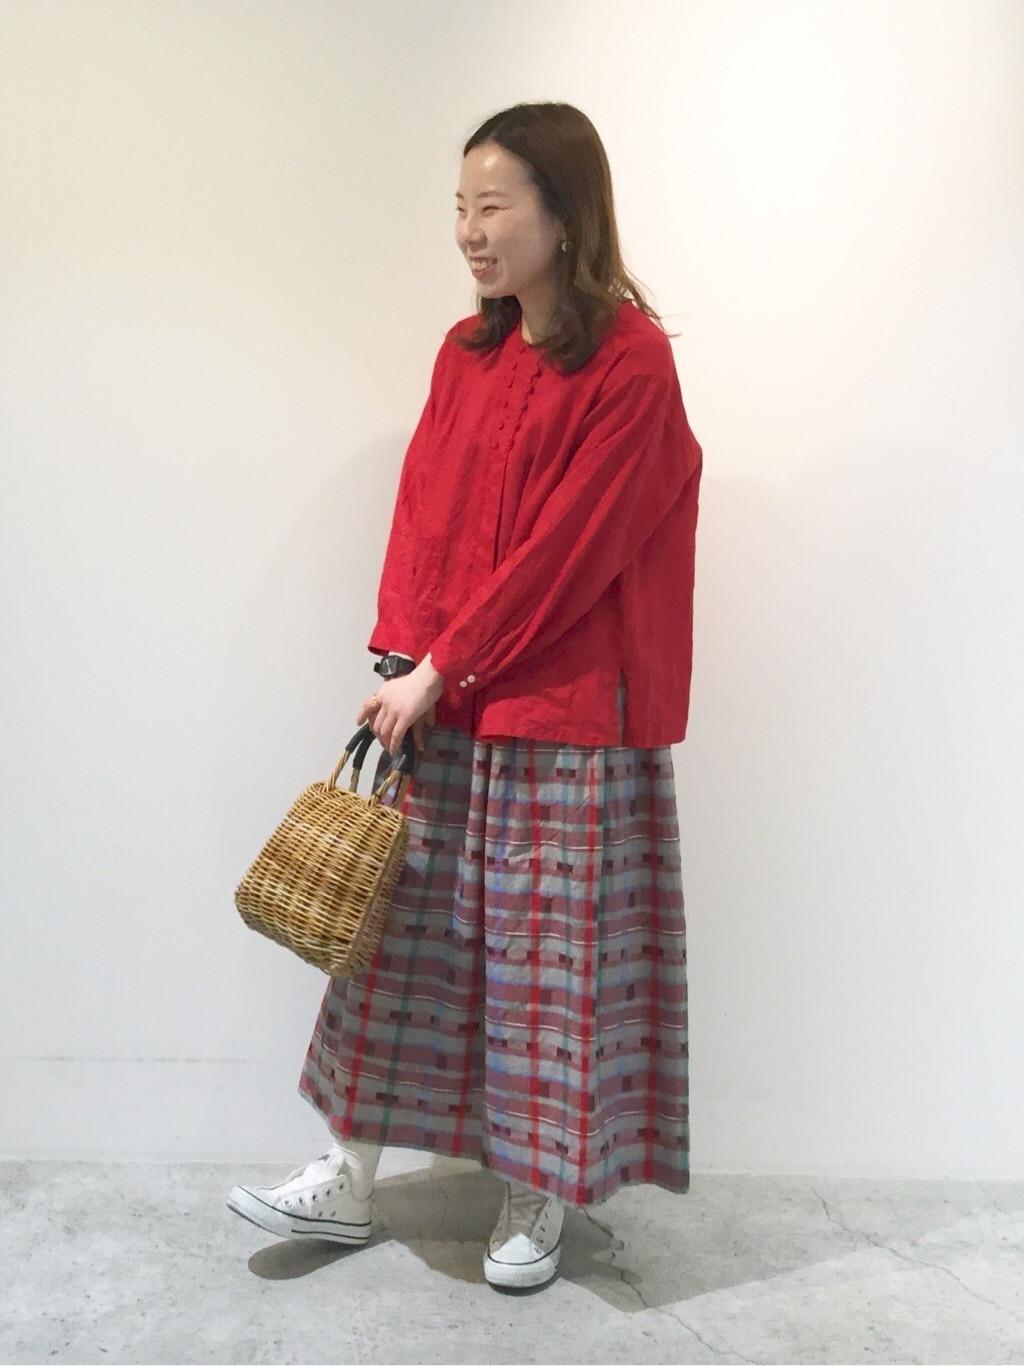 chambre de charme 京都路面 身長:155cm 2020.05.06